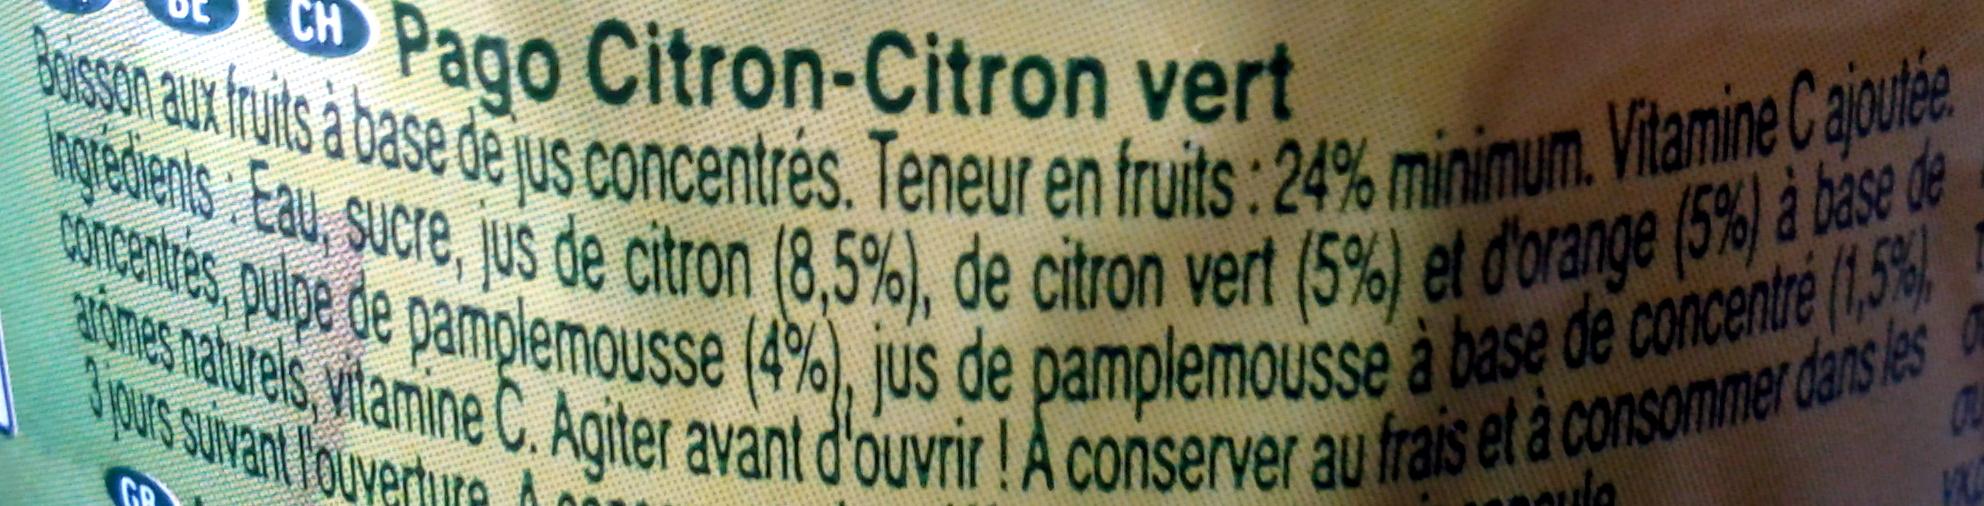 Pago Citron - Citron vert - Ingredients